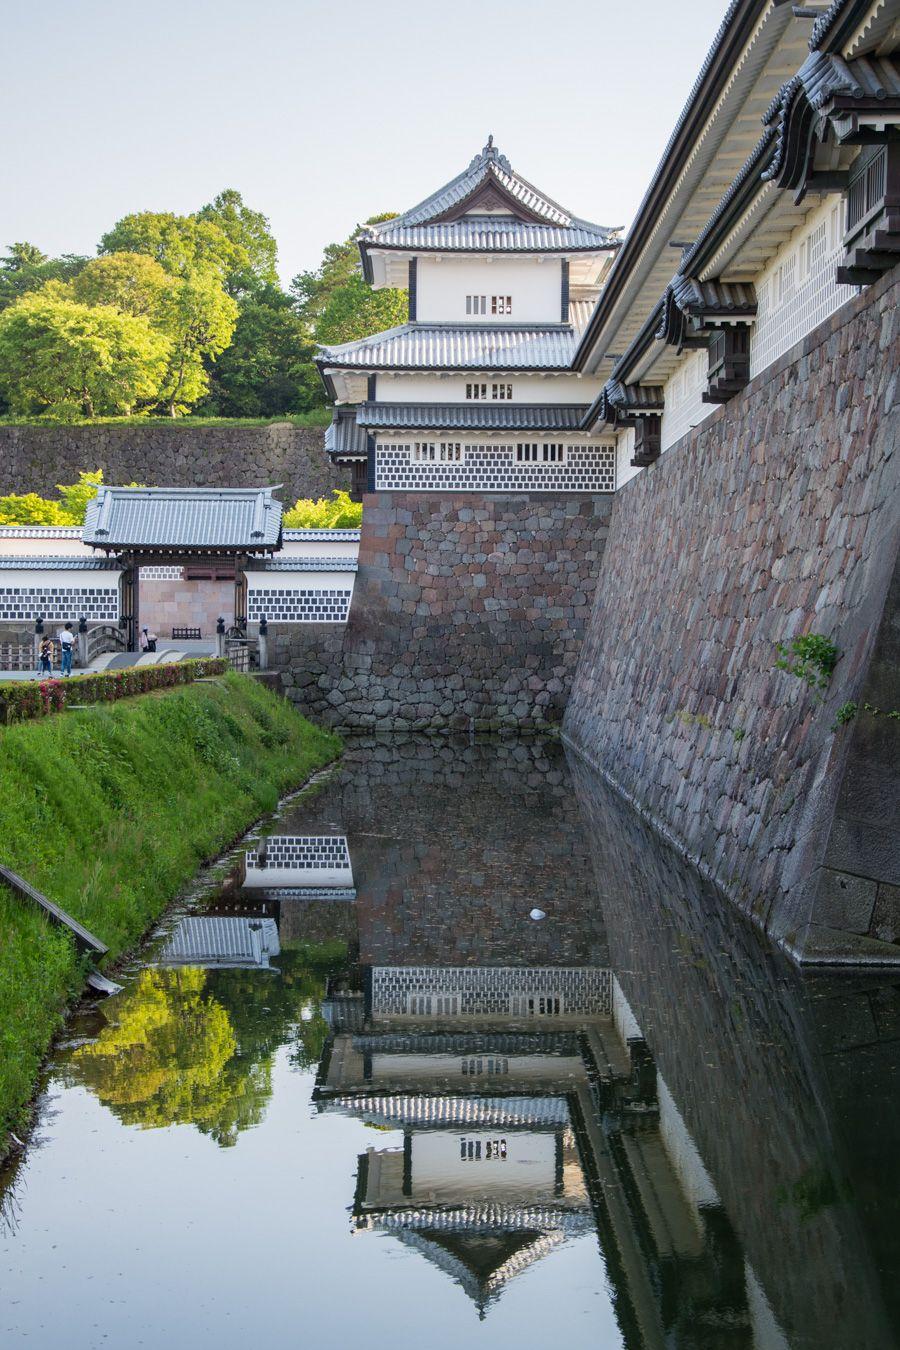 que faire a kanazawa - visiter kanazawa - château - librevoyageur